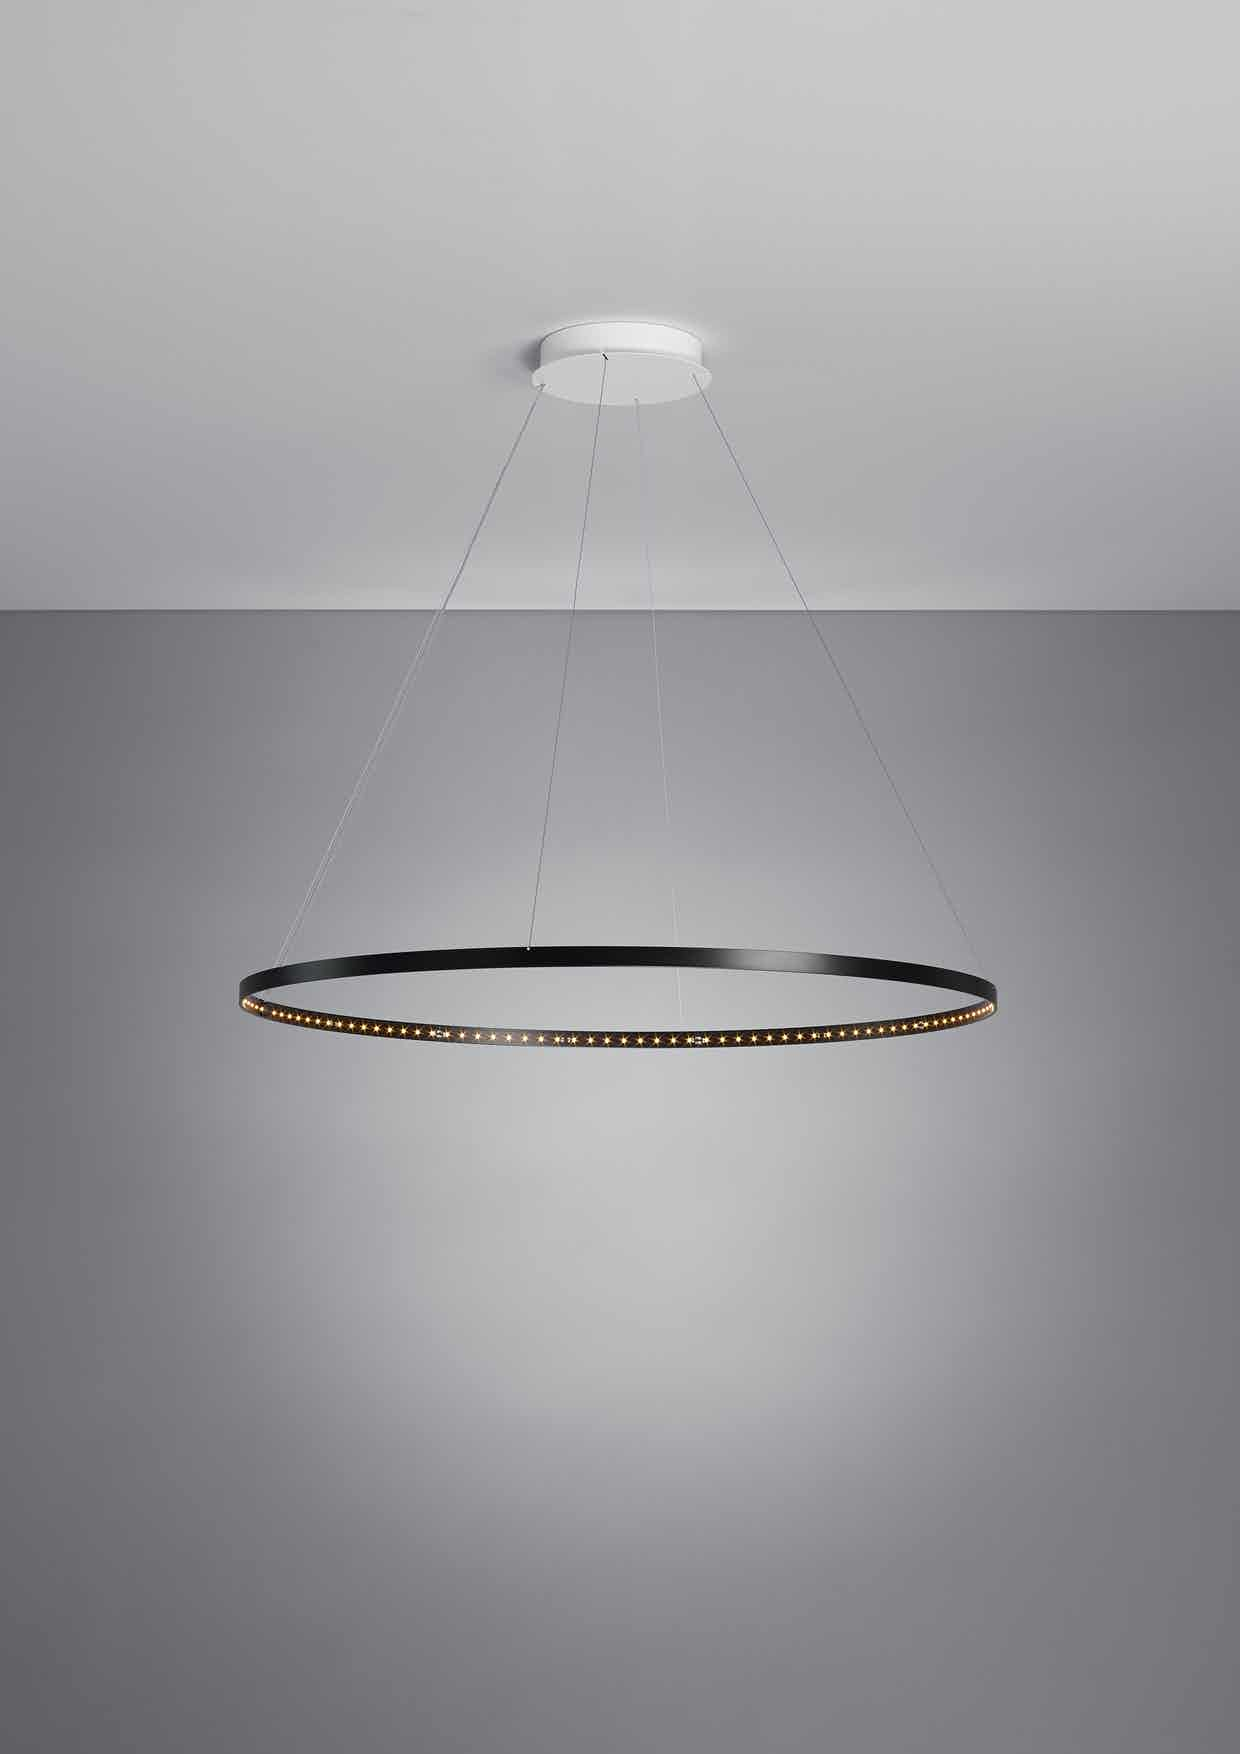 Le-deun-luminaires-circle-80-hanging-lamp-black-ceiling-haute-living